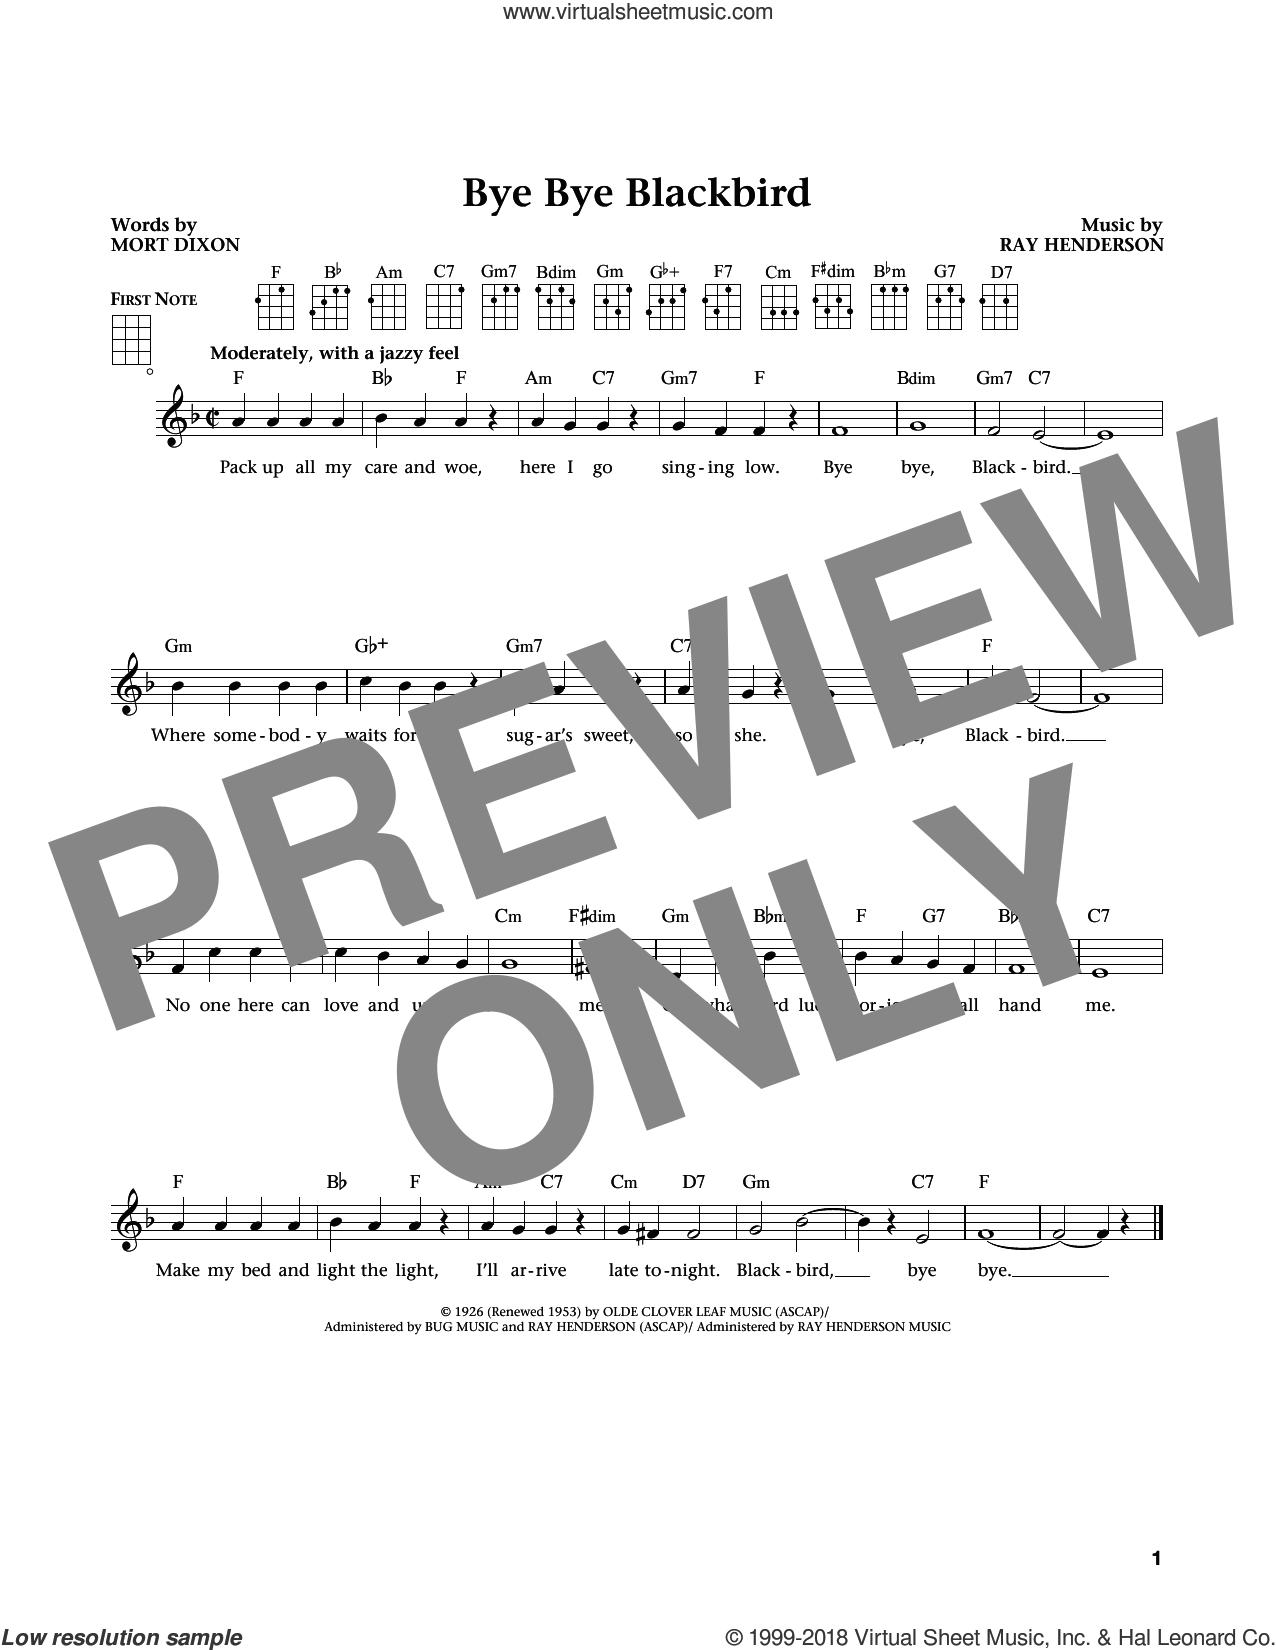 Bye Bye Blackbird (from The Daily Ukulele) (arr. Liz and Jim Beloff) sheet music for ukulele by Ray Henderson, Jim Beloff, Liz Beloff and Mort Dixon, intermediate skill level